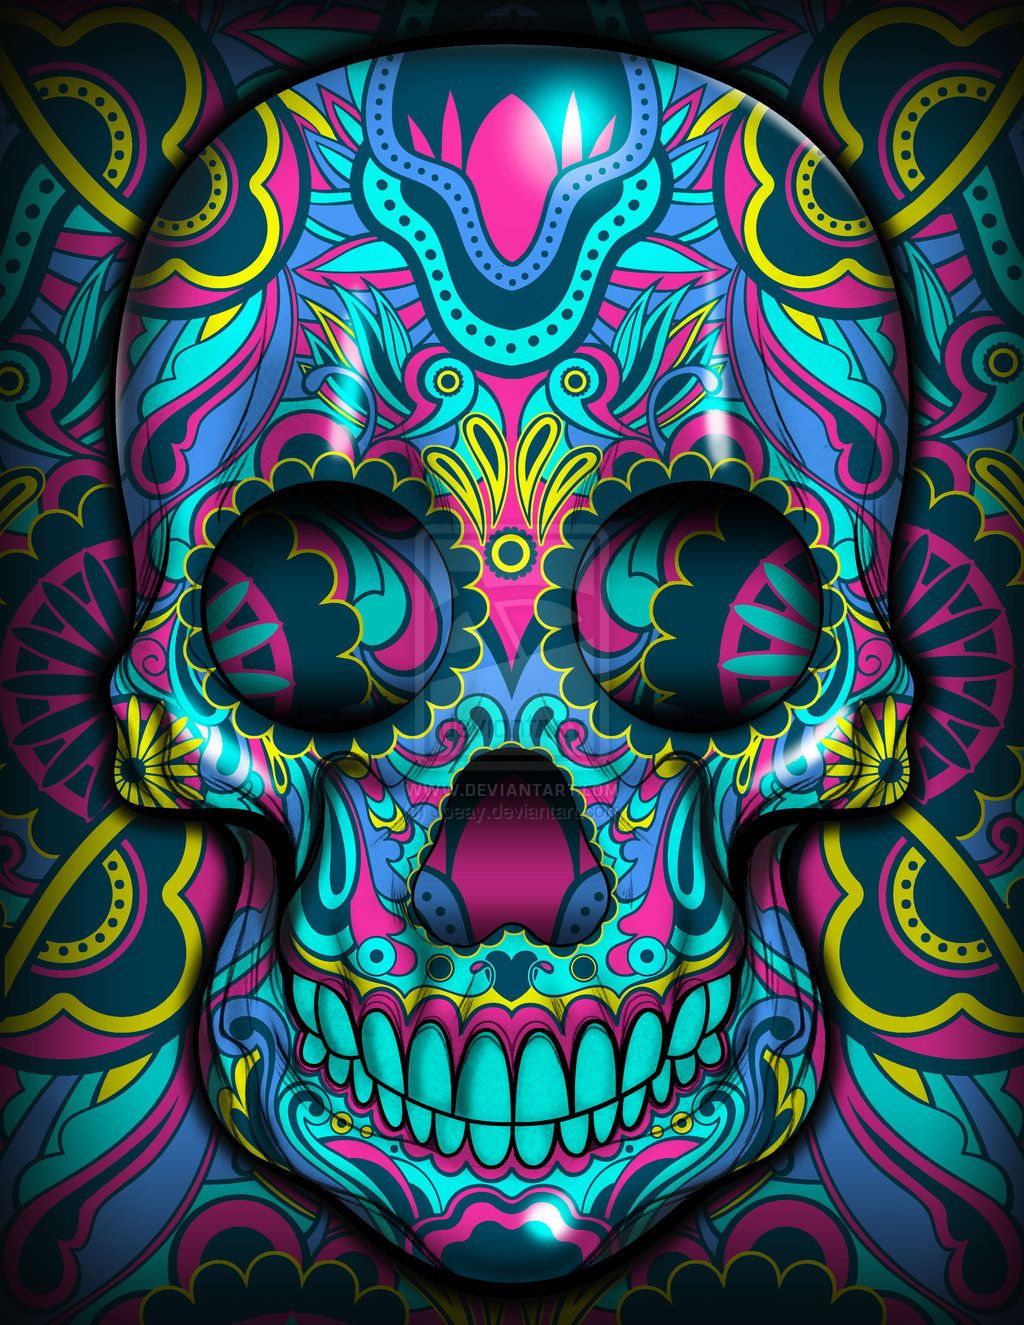 Skulls la vengadora by jpeay on deviantart